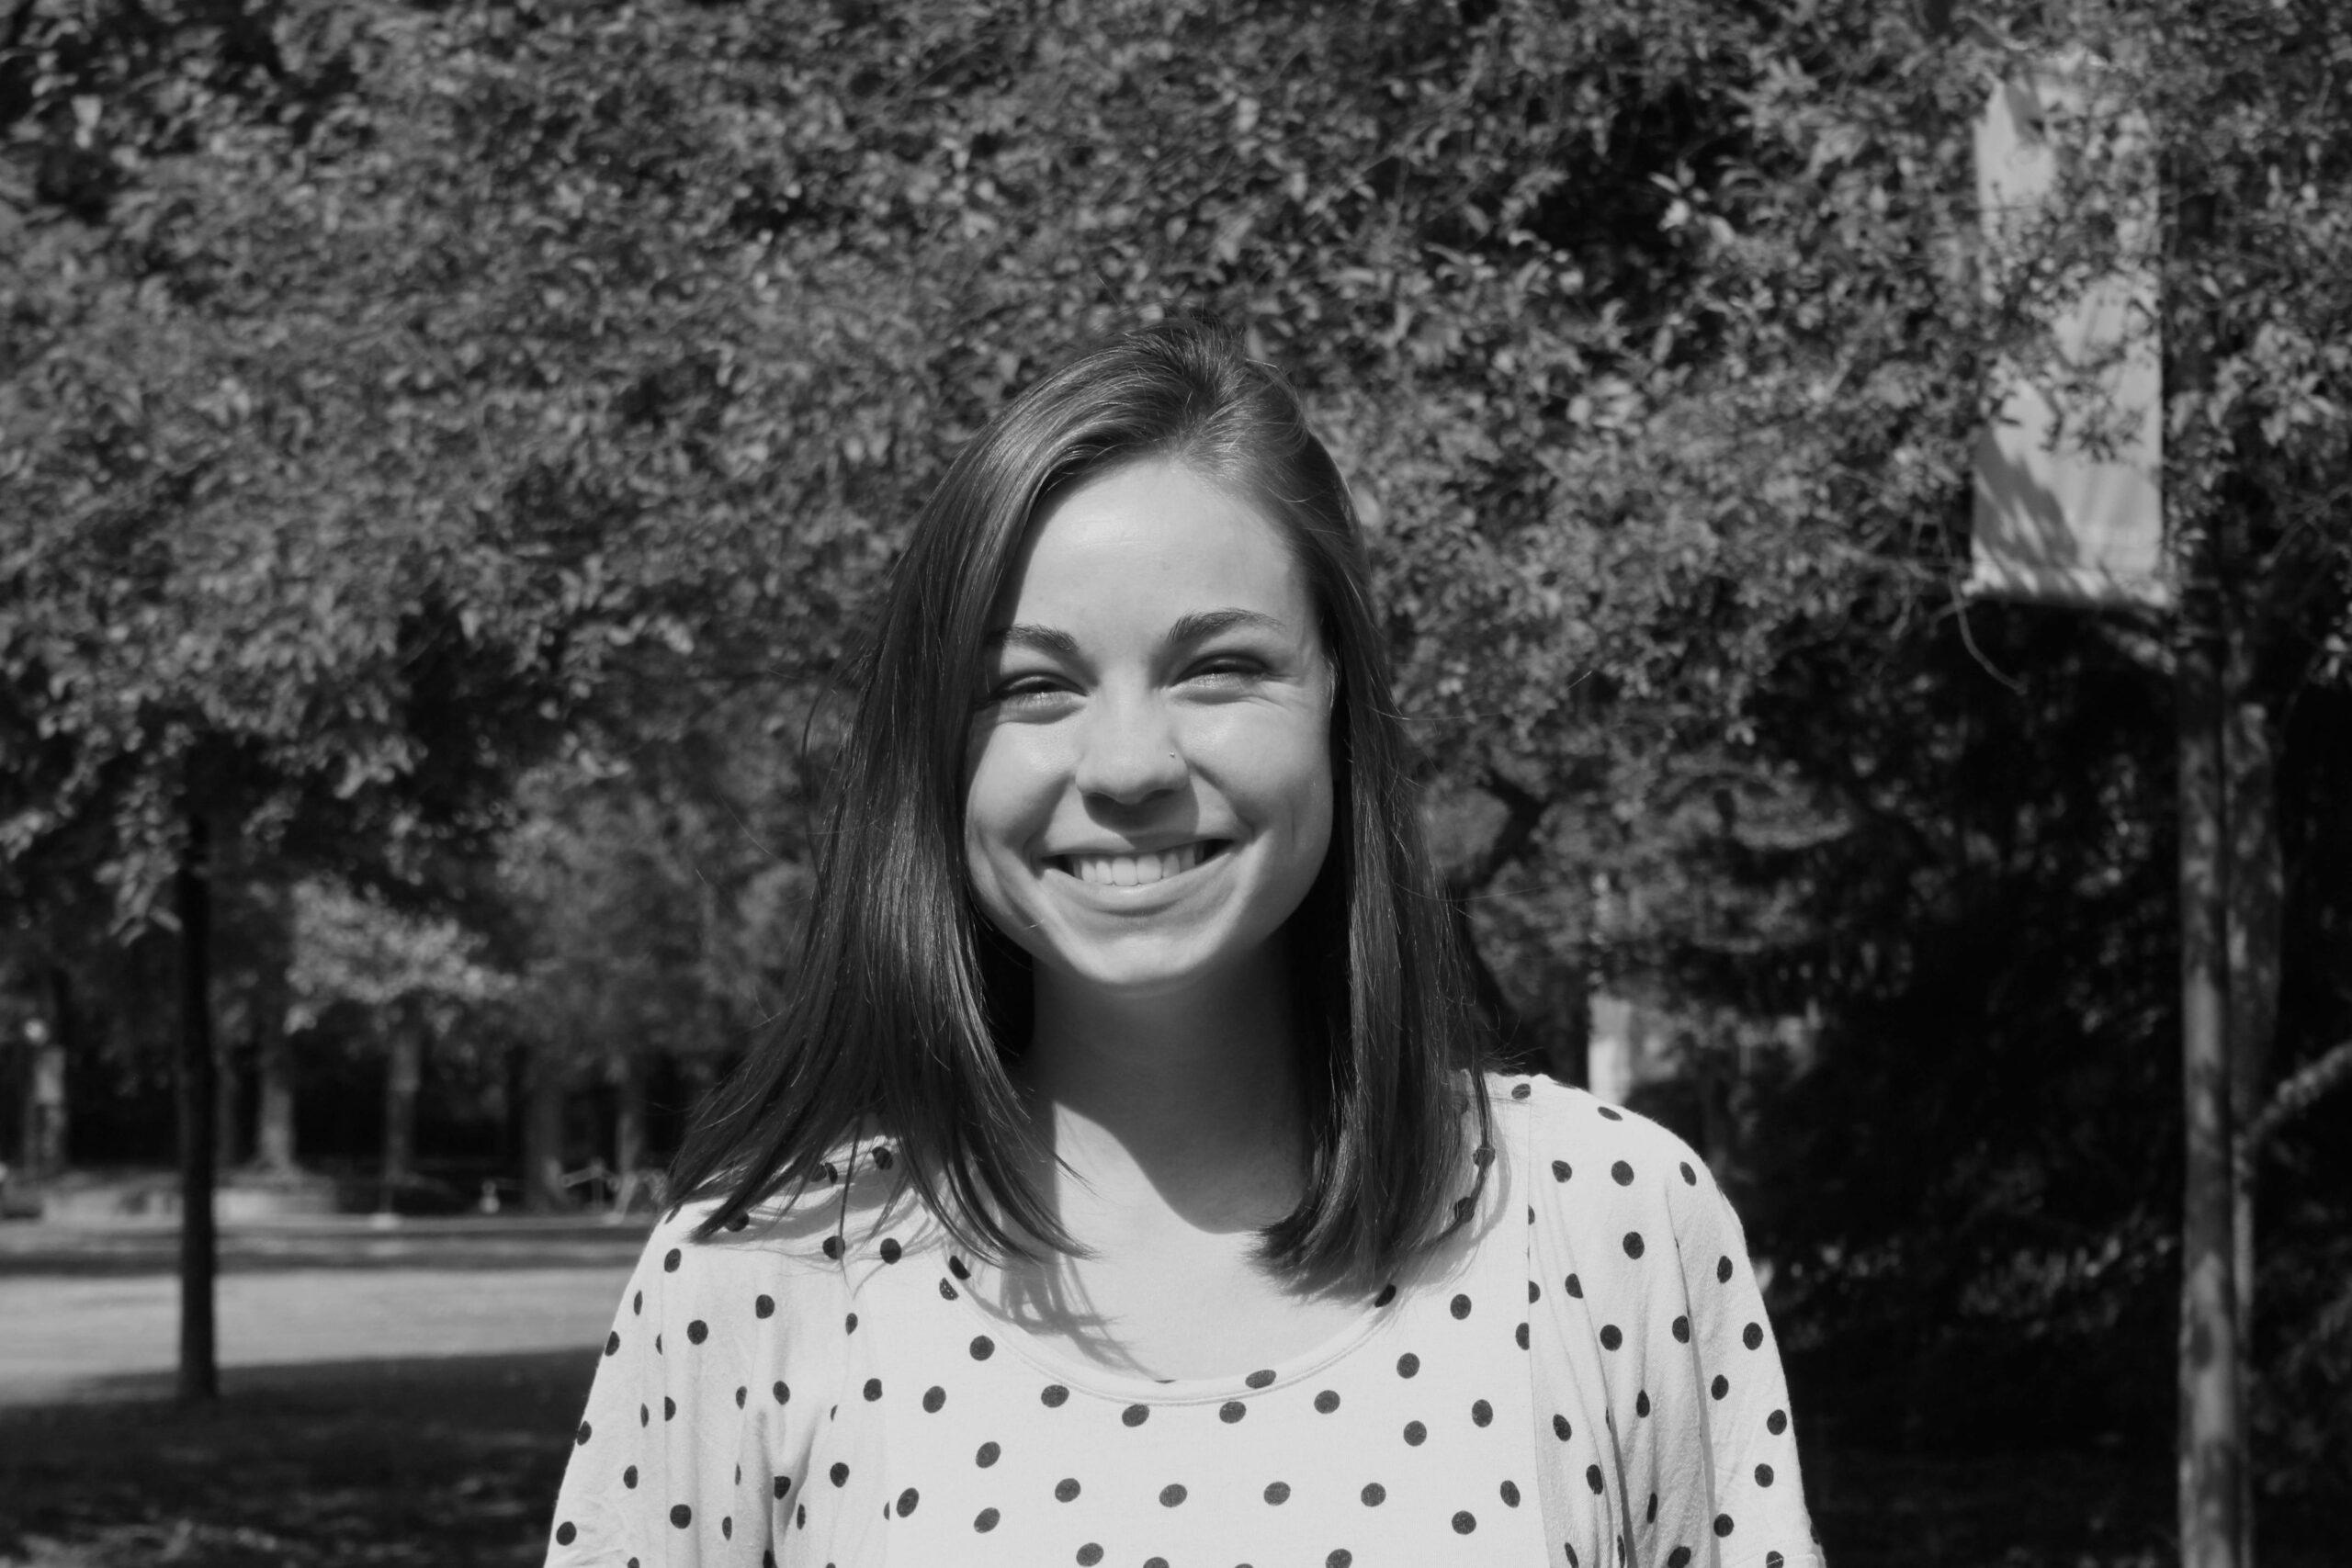 Black and white portrait of Mackenzie Miller